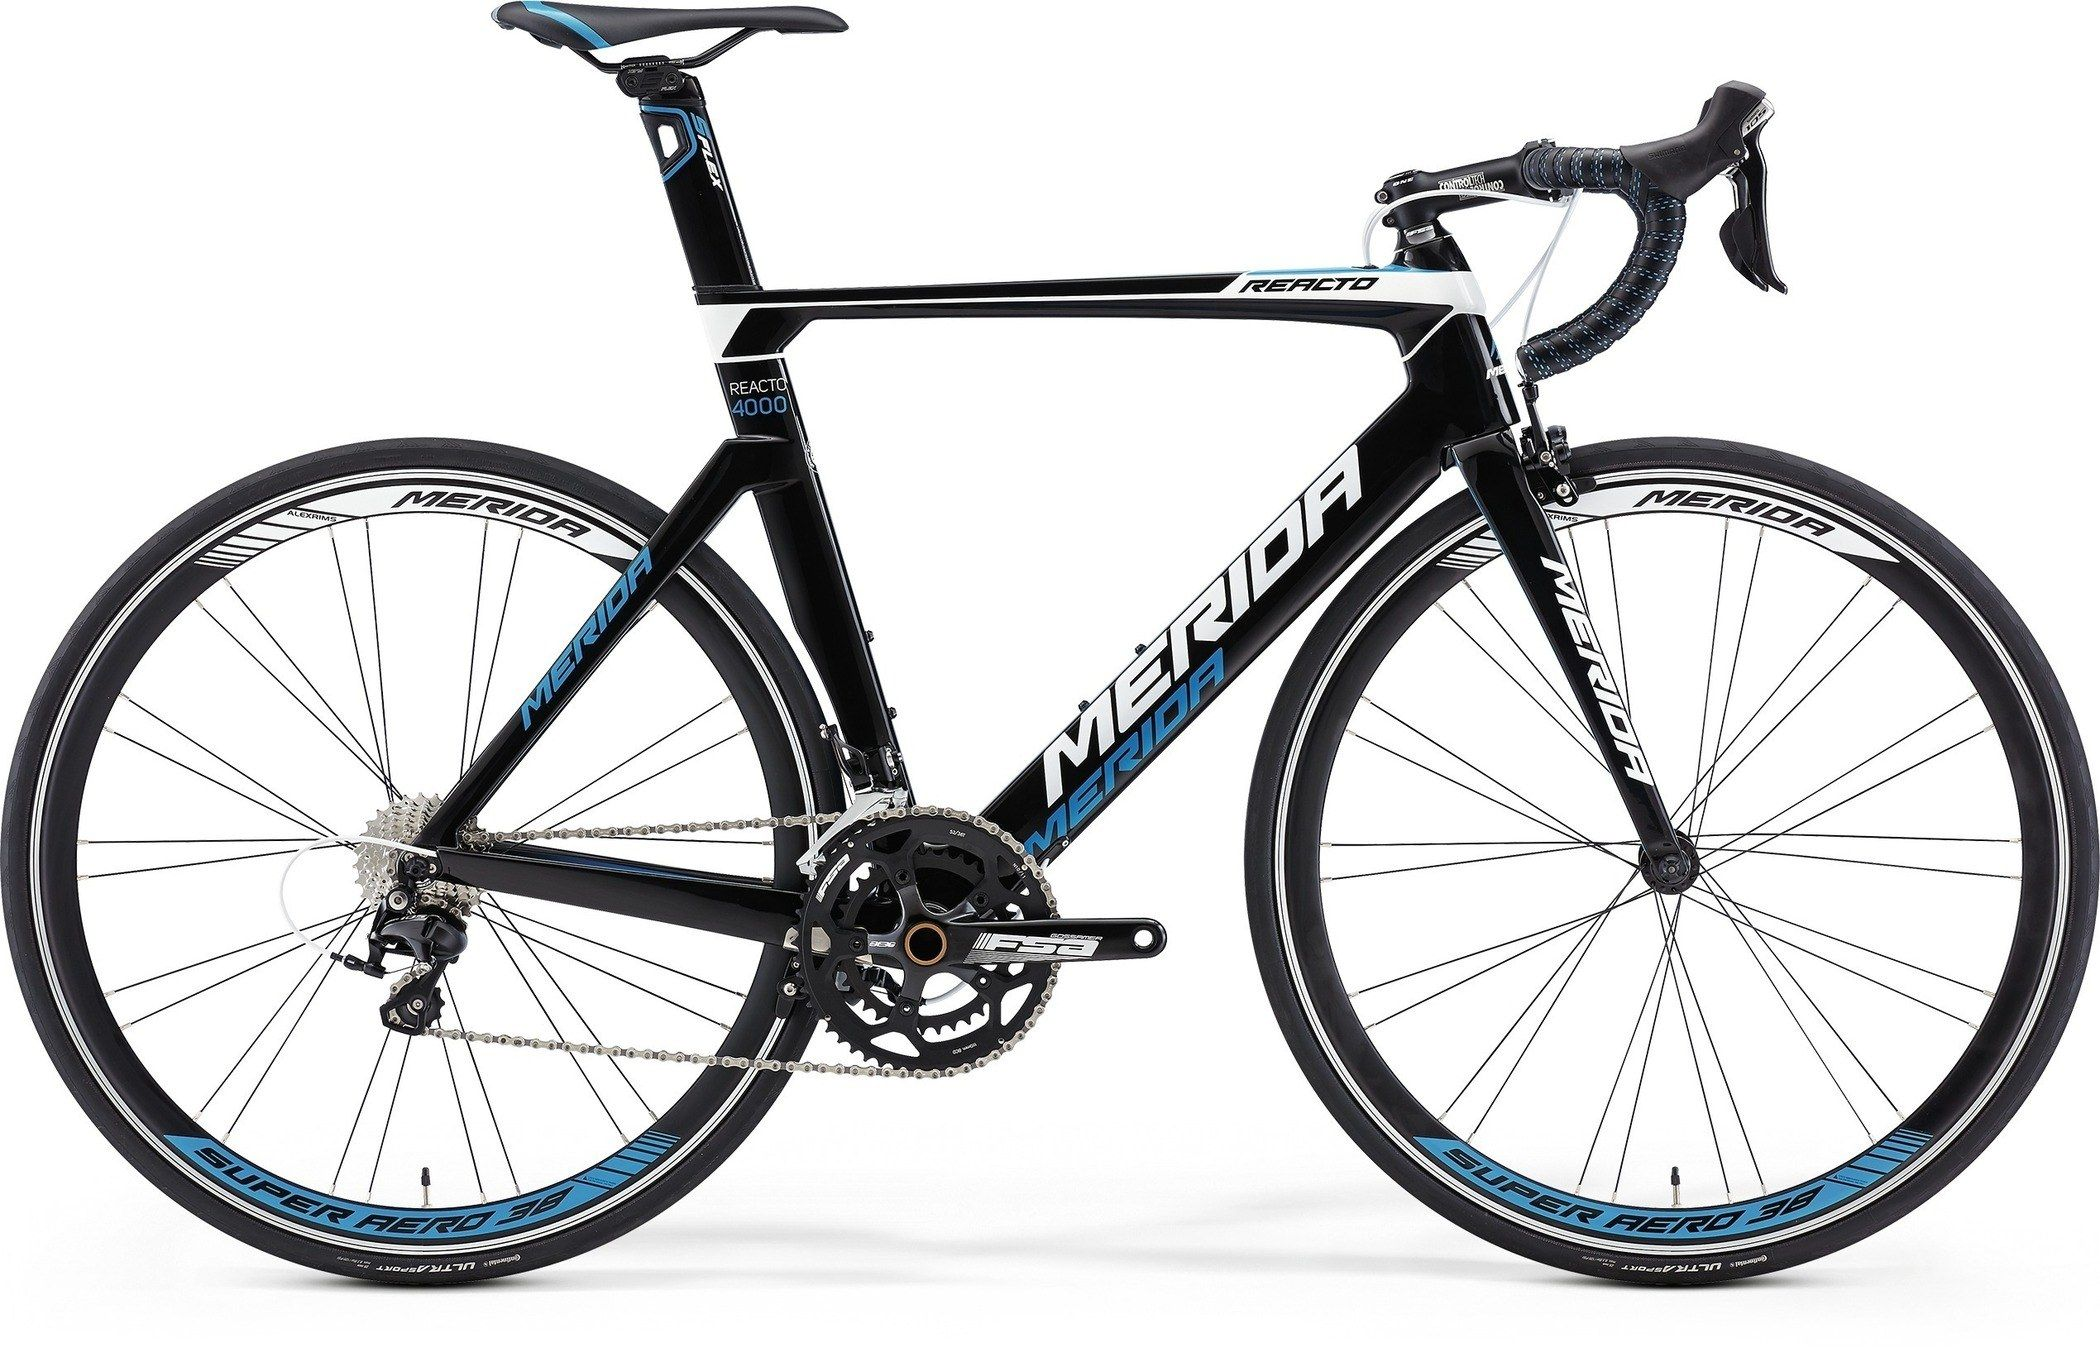 Reacto 4000 - Road & Fitness - Race - Merida Bikes International ...